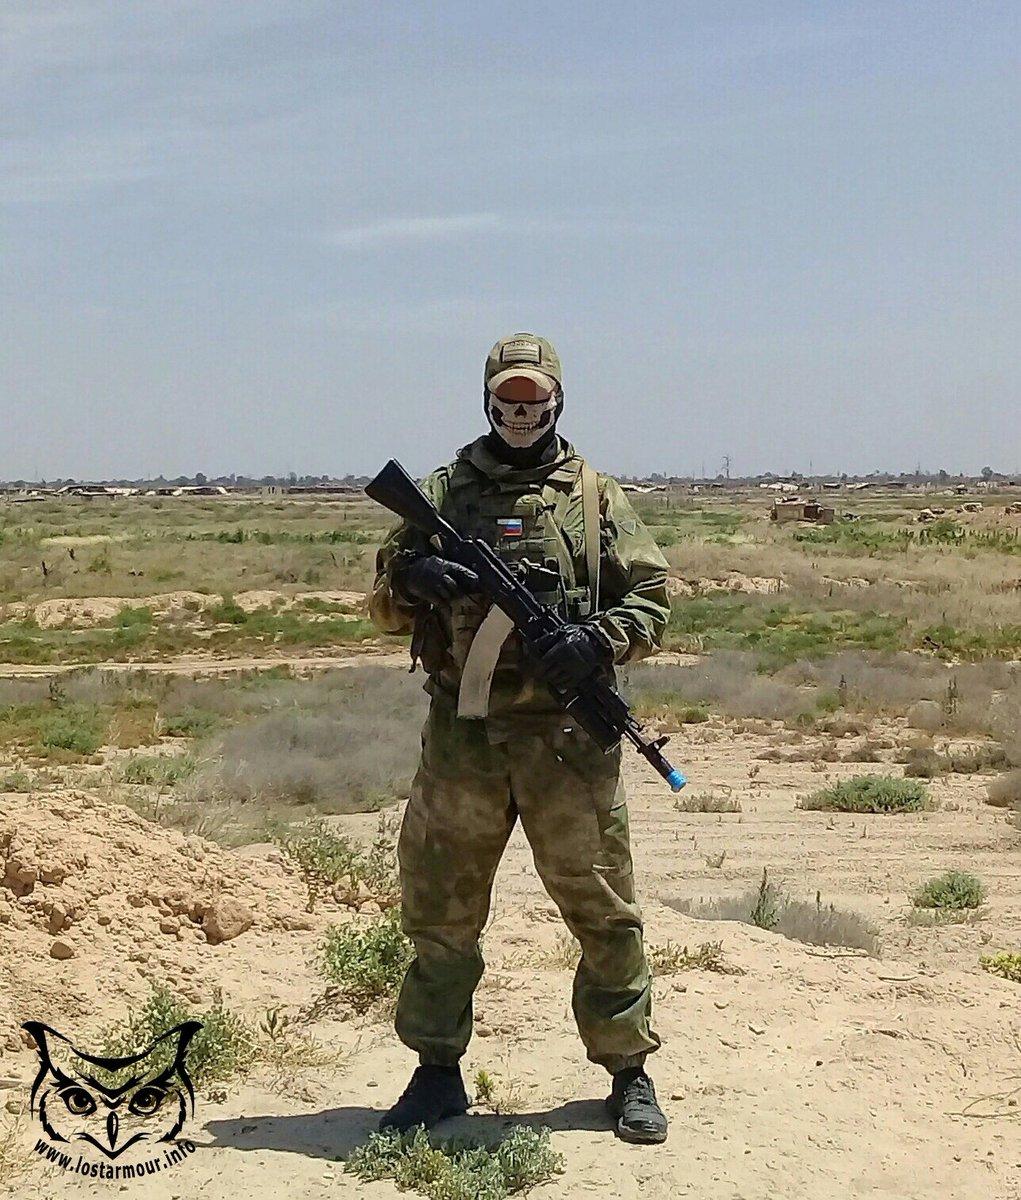 Спецназ гру россии в сирии